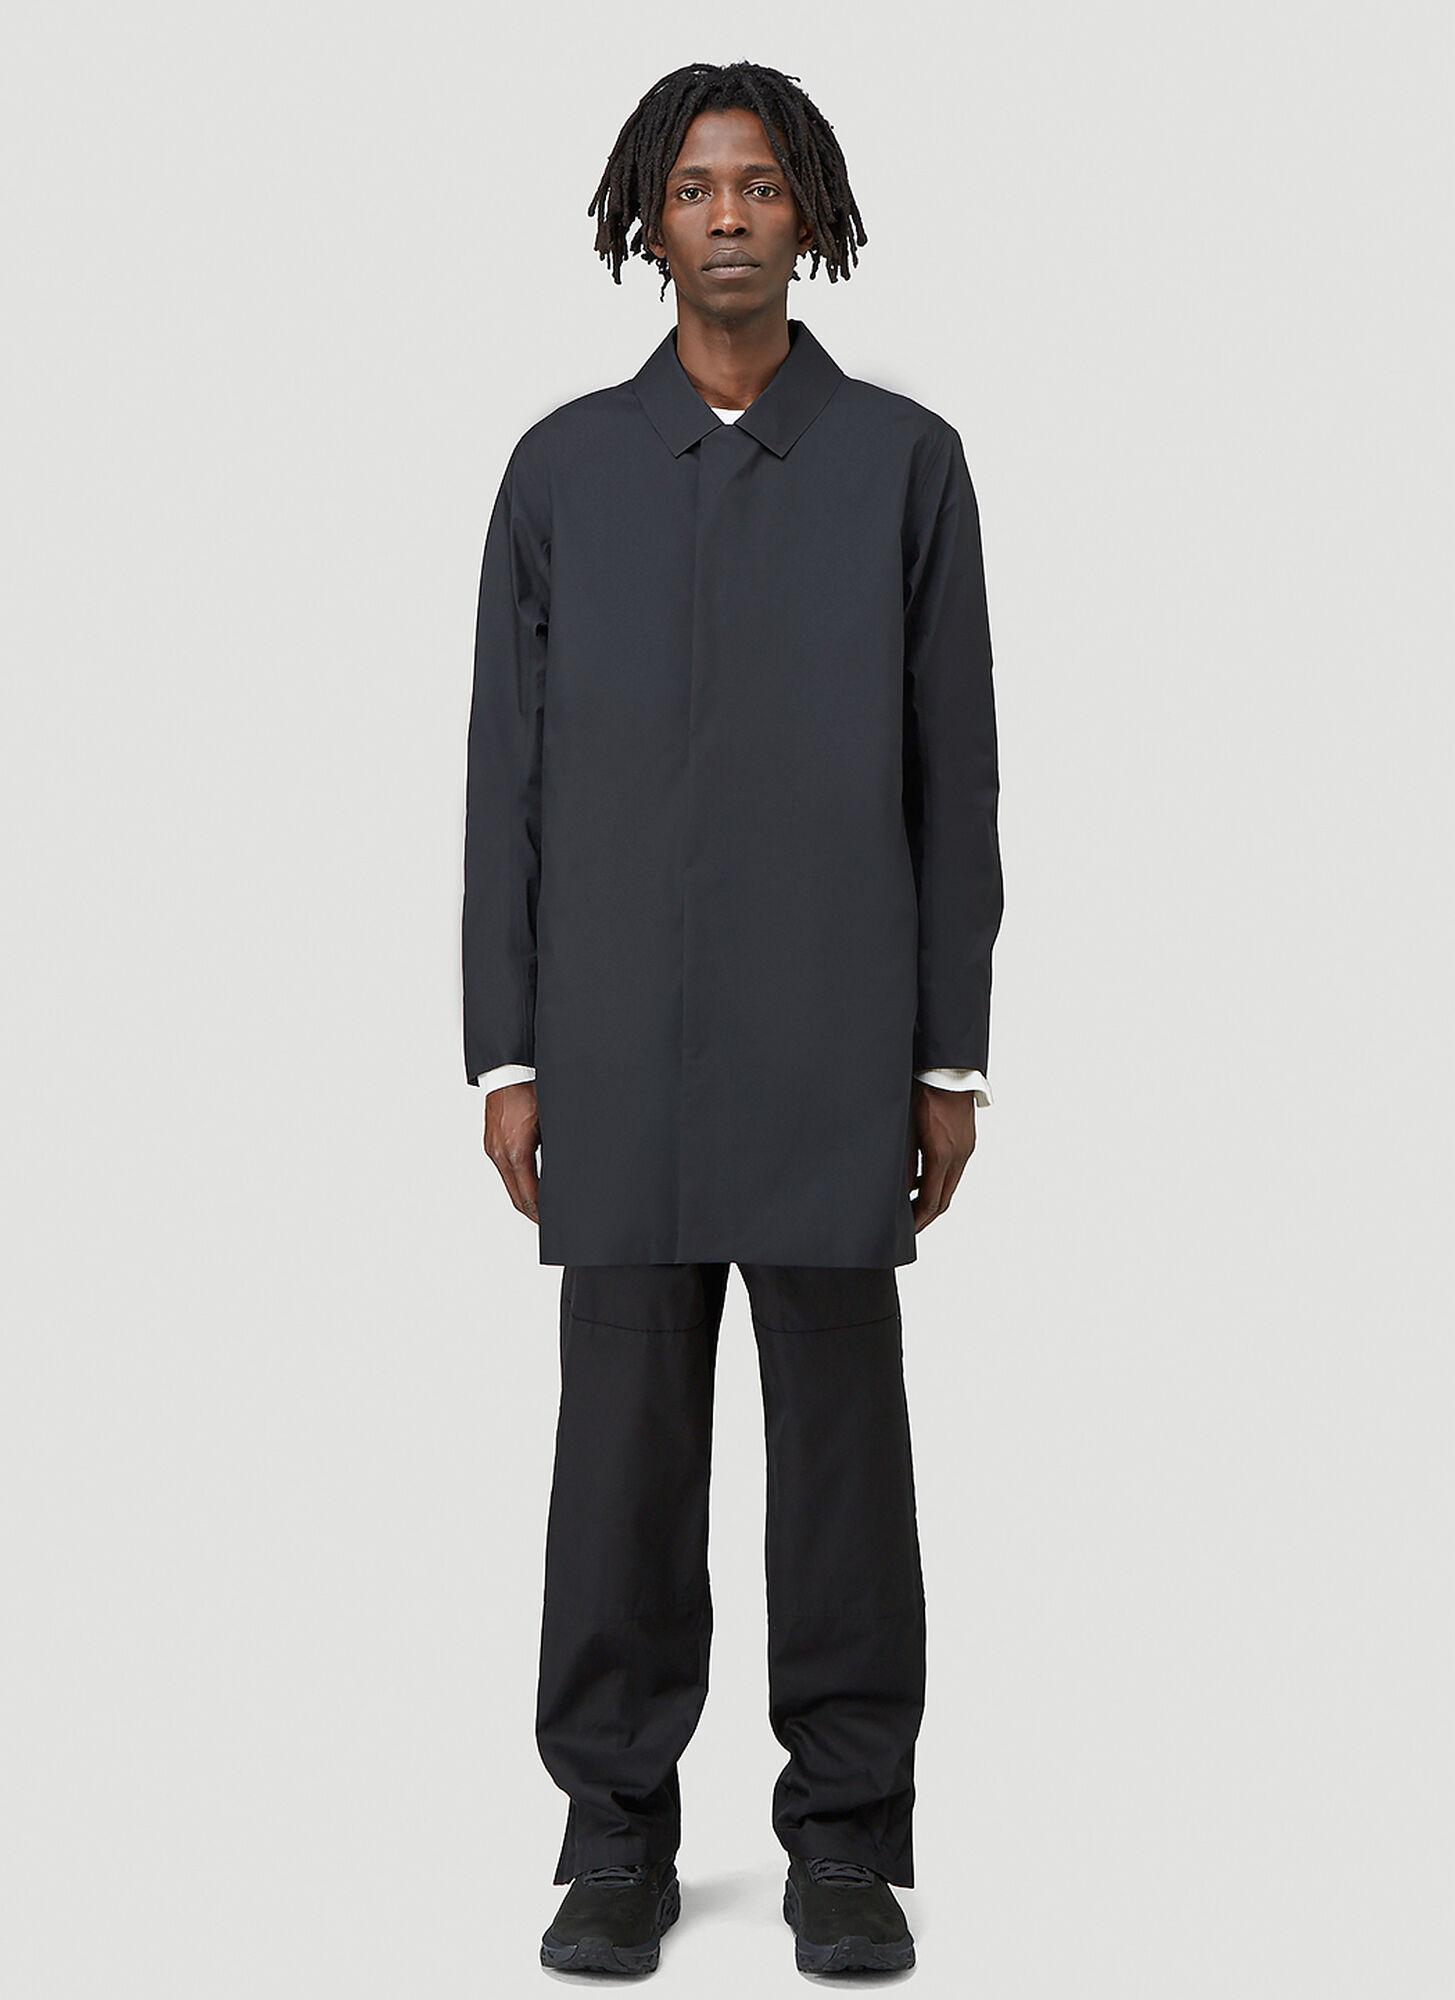 male Black 100% Polyamide, 100% Polyester.